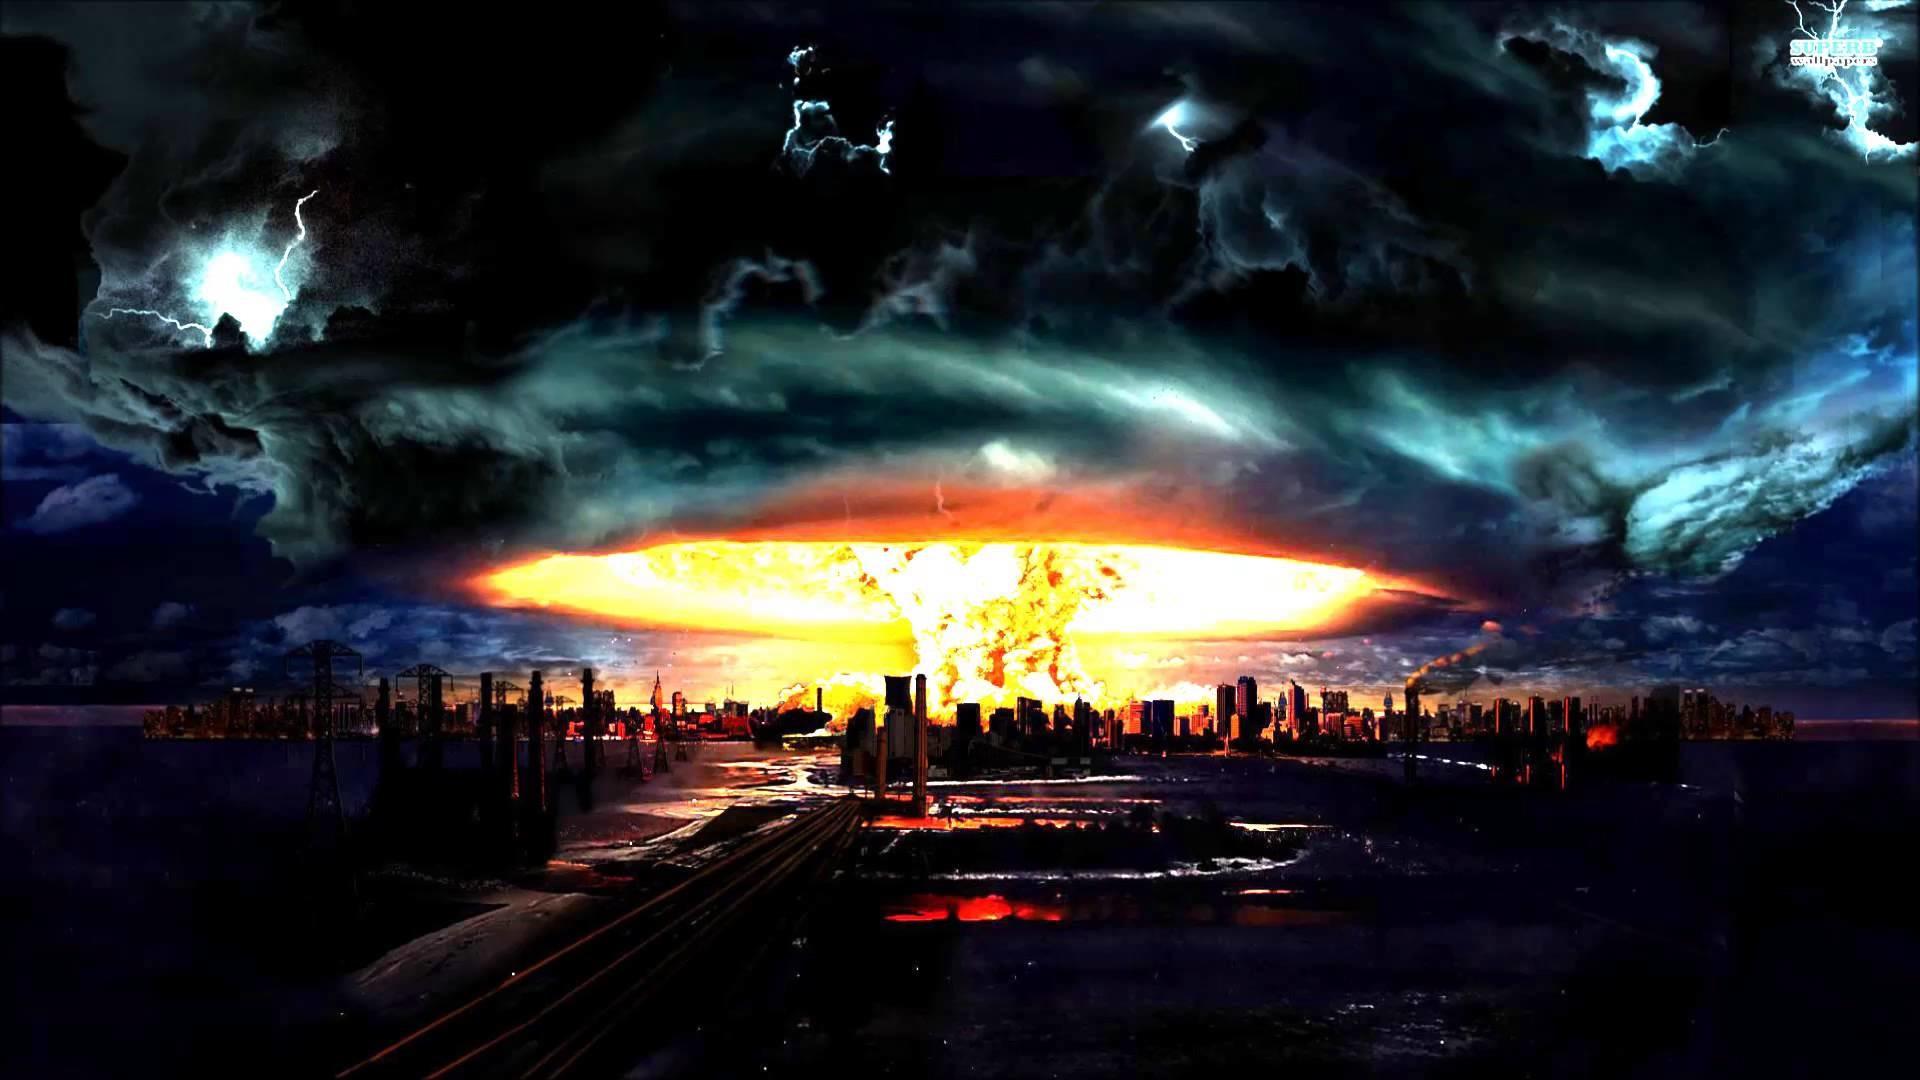 Nuke explosion wallpaper 64 images - Explosion wallpaper ...